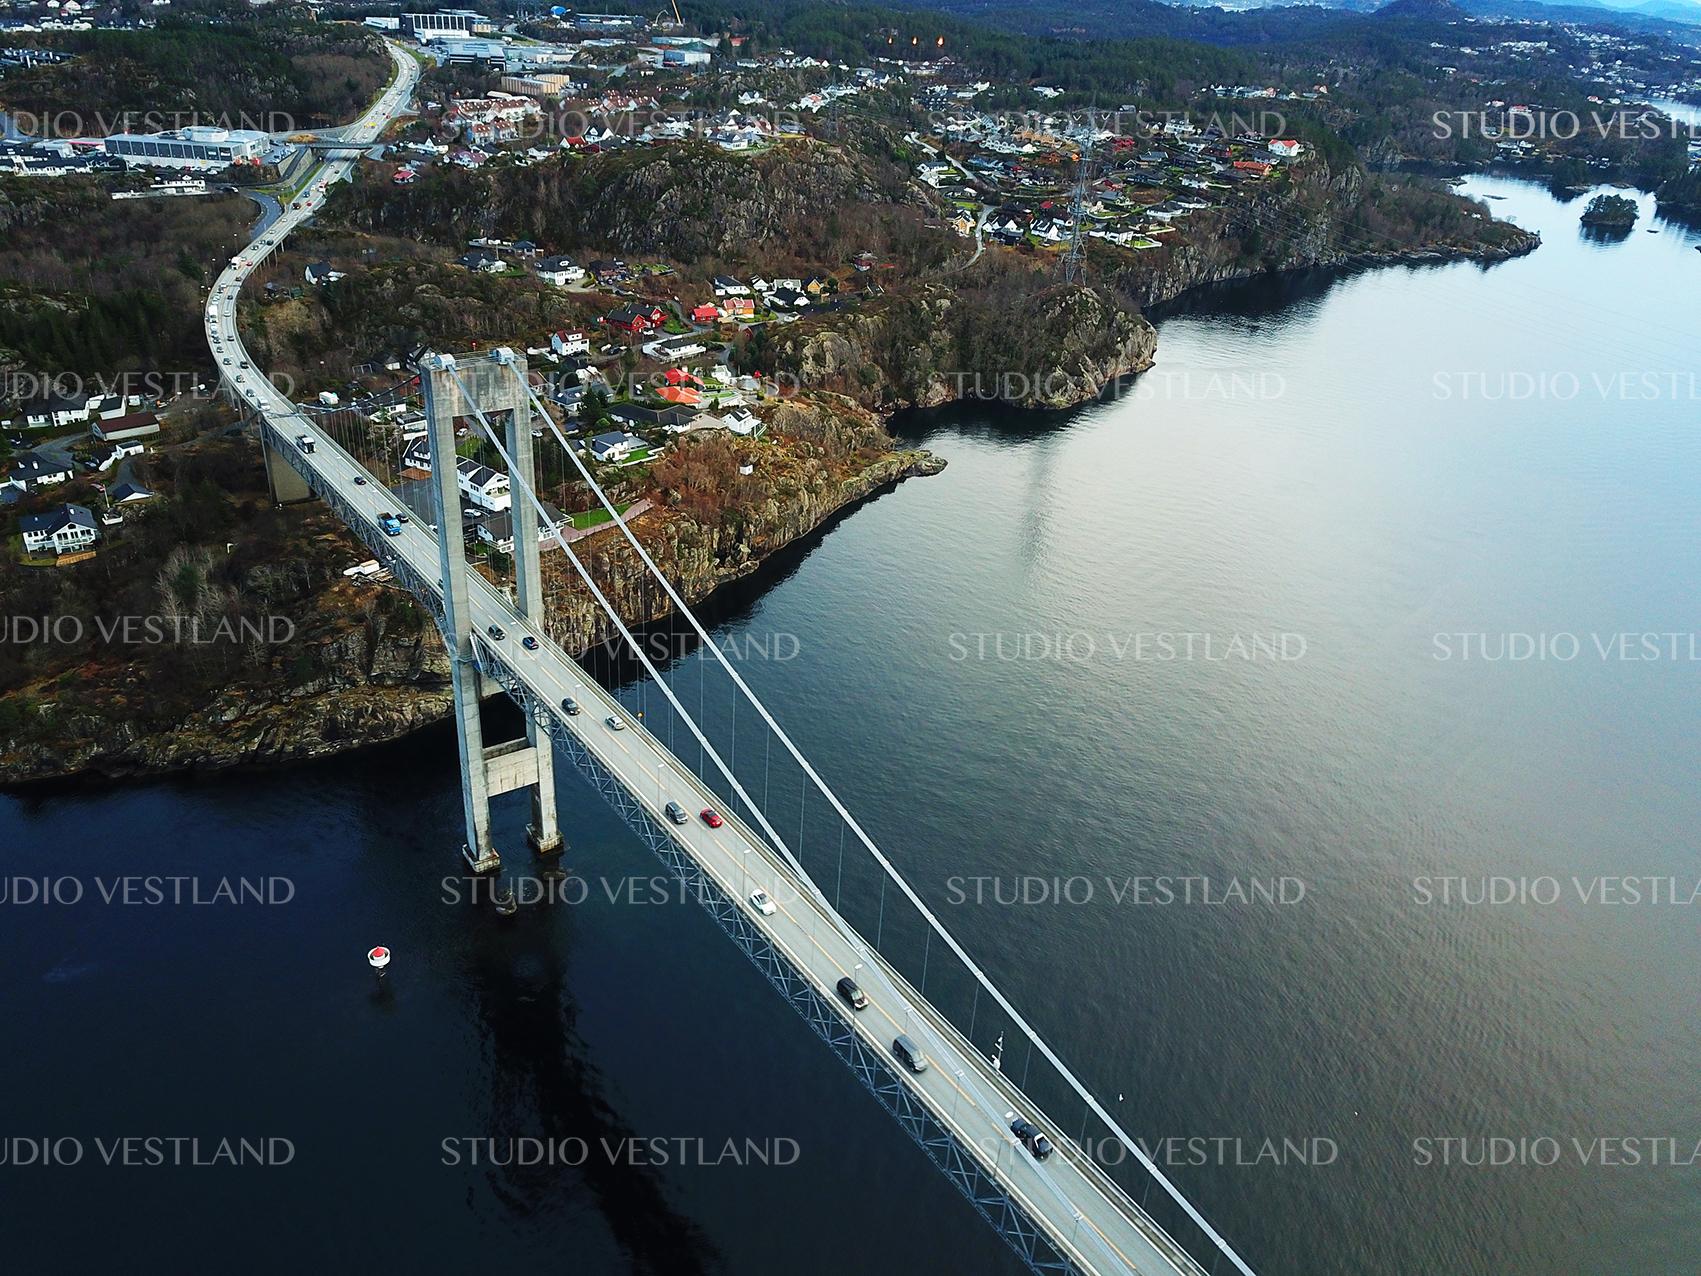 Studio Vestland - Drotningsvik 05